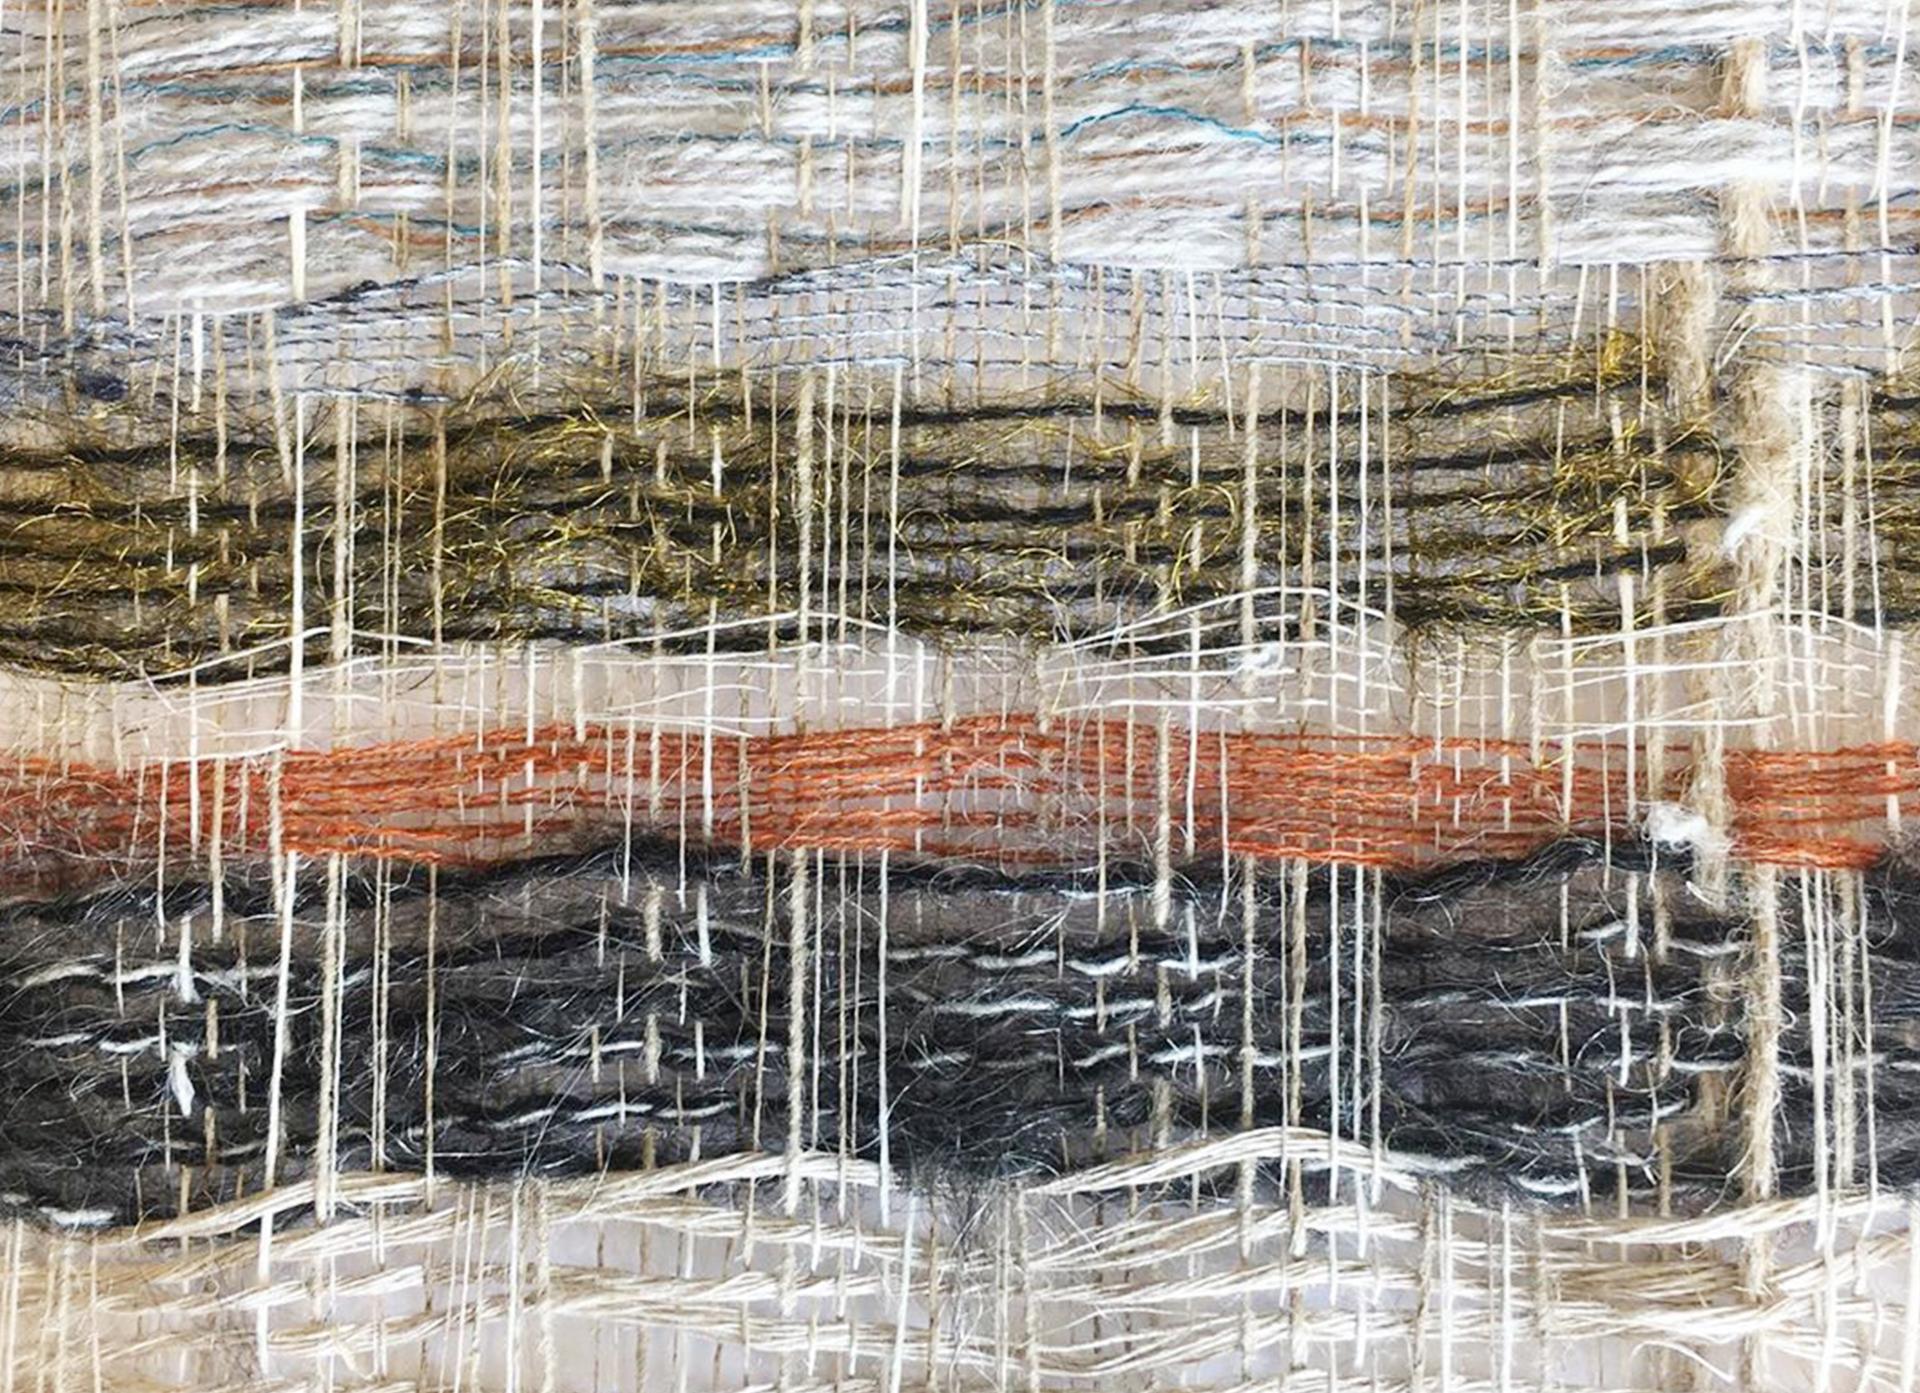 weaving artist Veronica Pock details